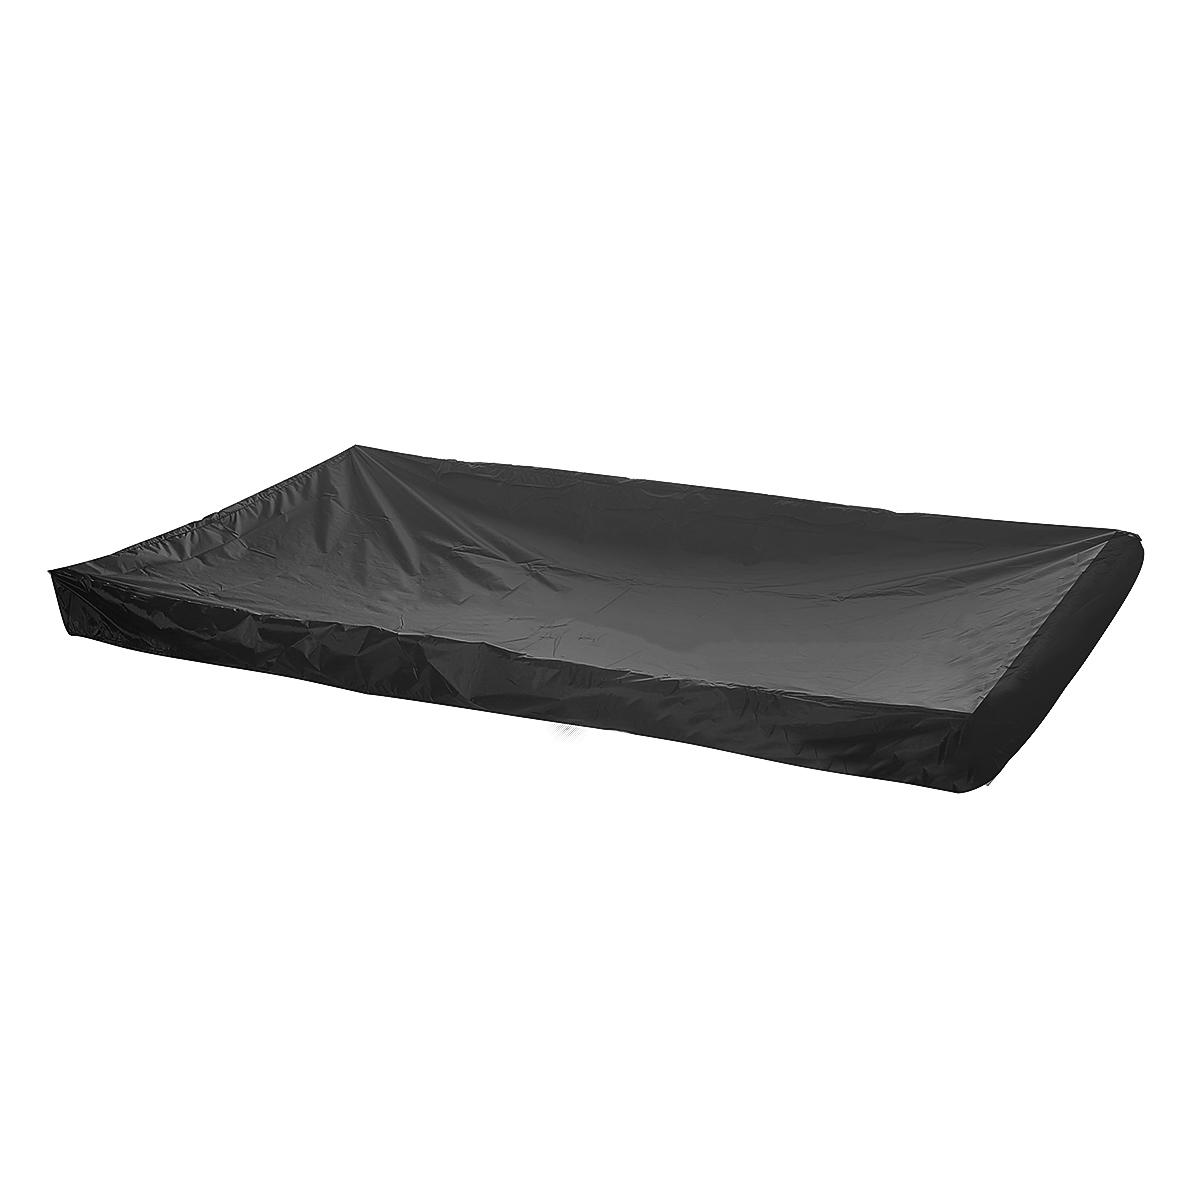 BLACK PVC Pool Snooker Billiard Table Waterproof Dust Cover for 8' ft pool table